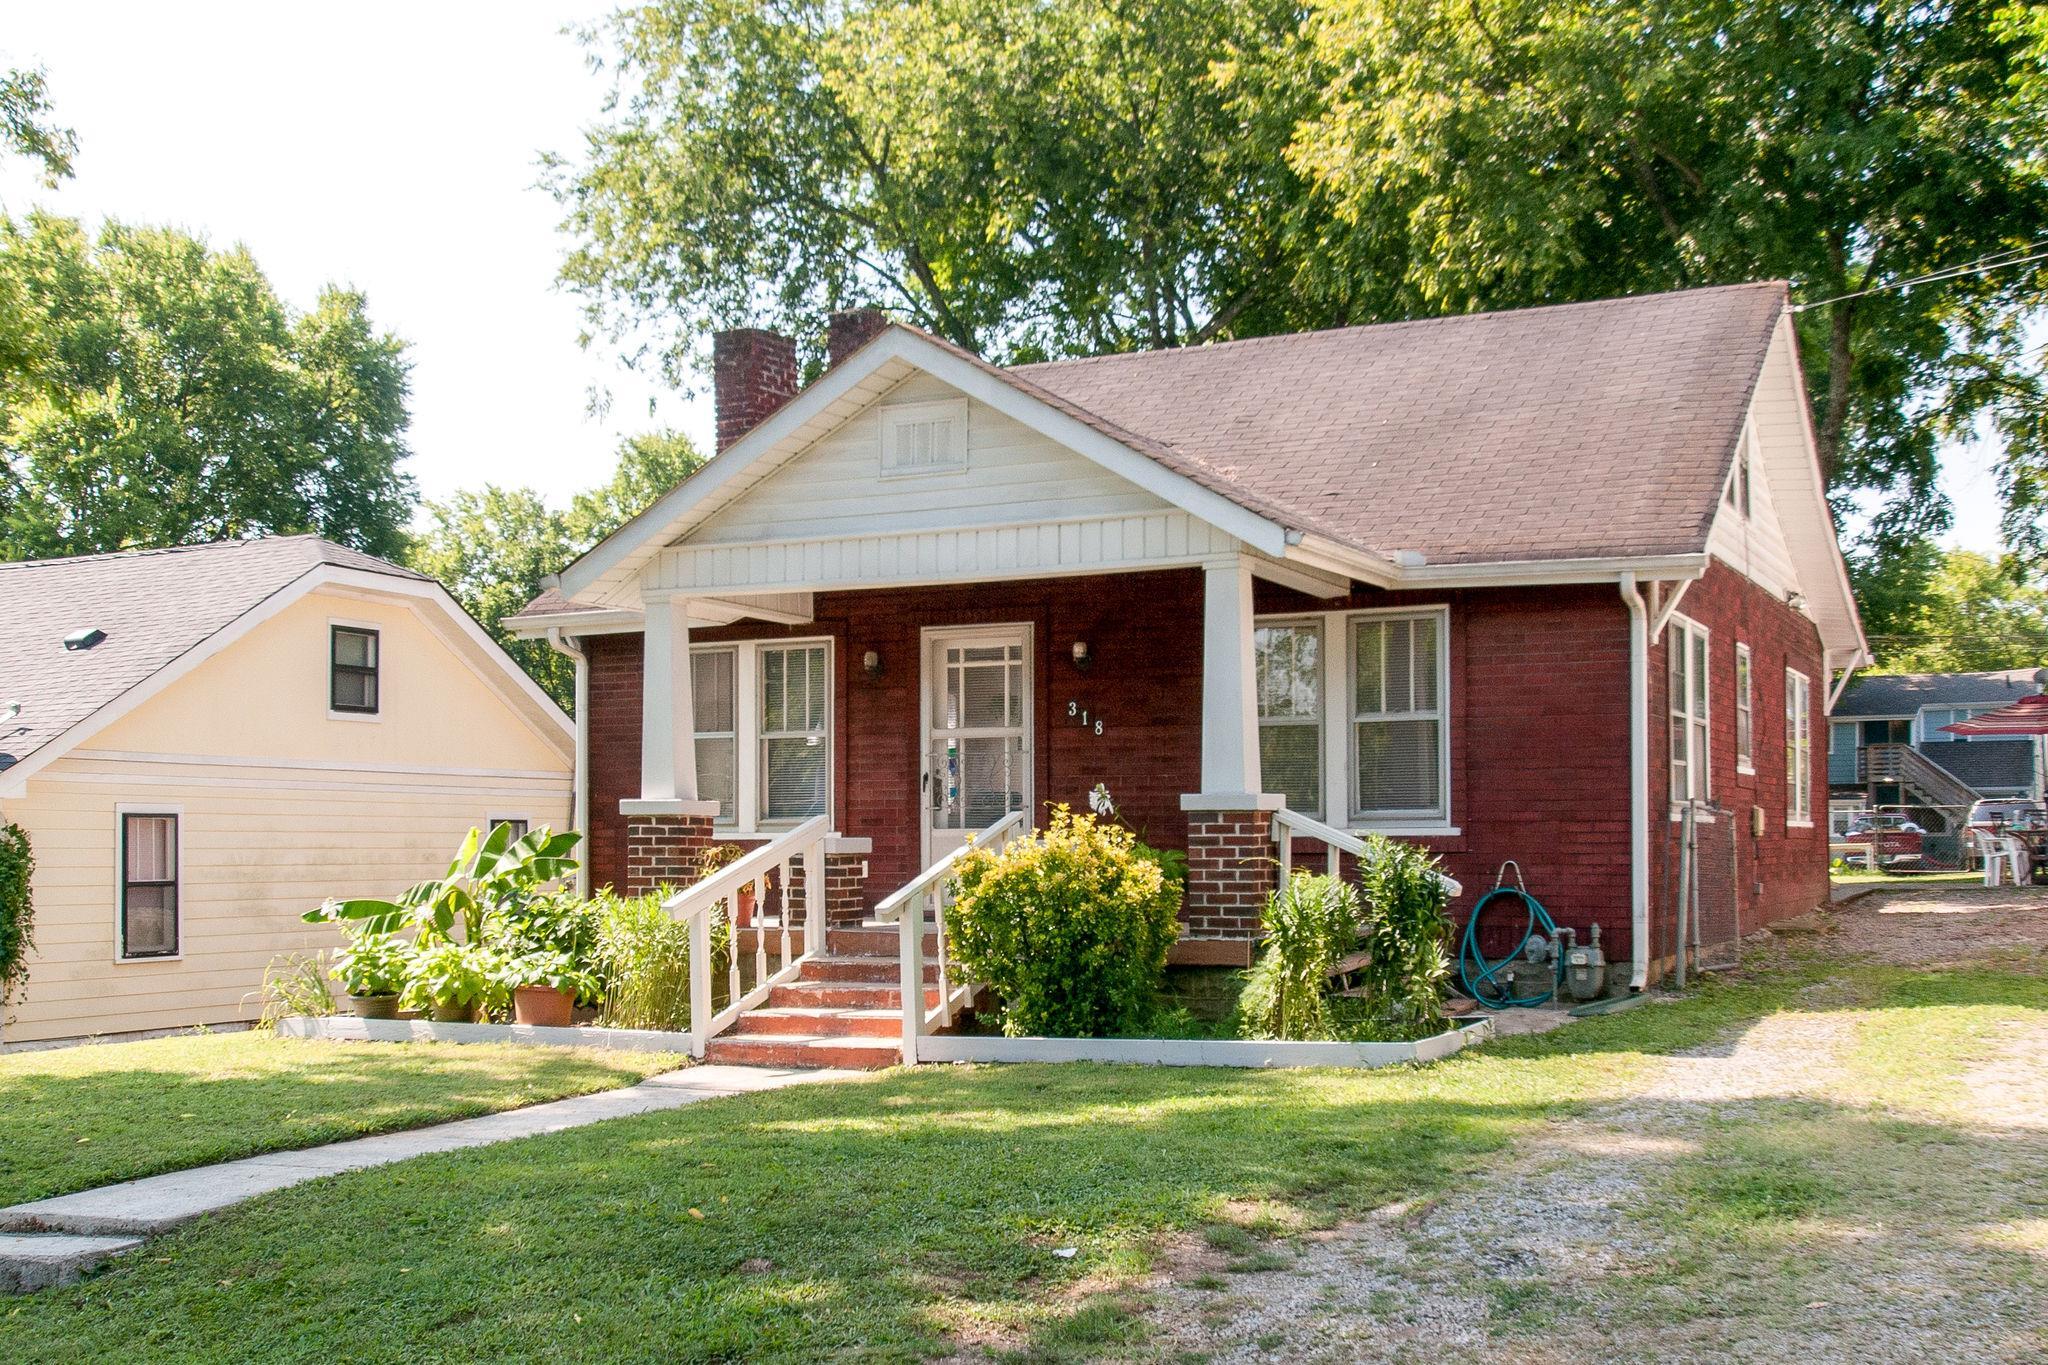 318 Pullen Ave, Nashville, TN 37207 - Nashville, TN real estate listing